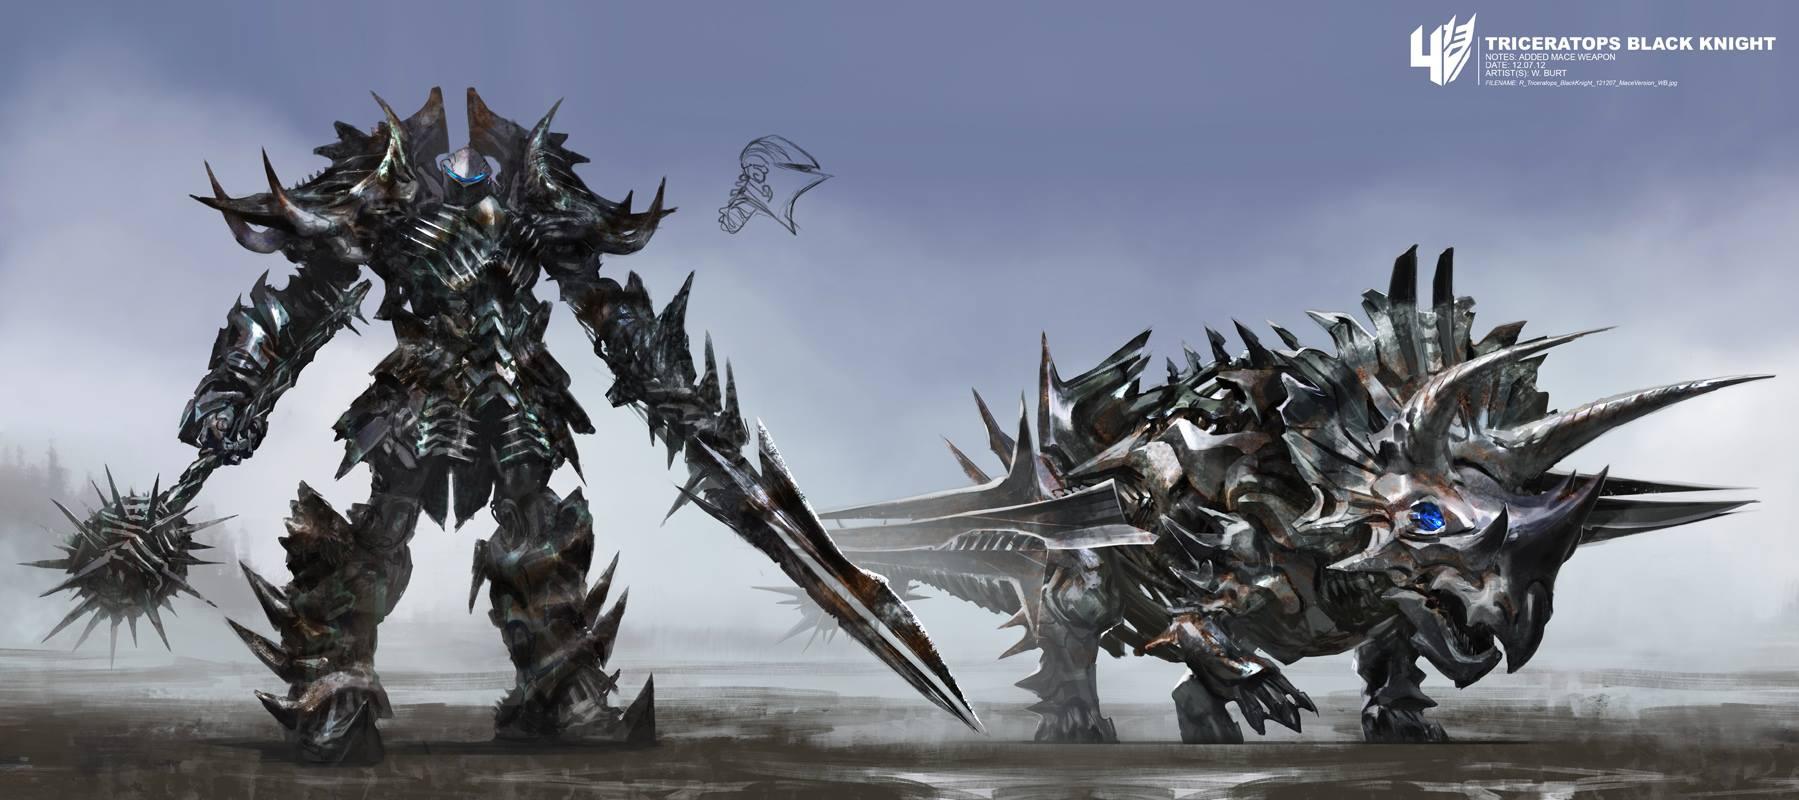 Transformers 4 Dinobots Concept Art By Wesley Burt